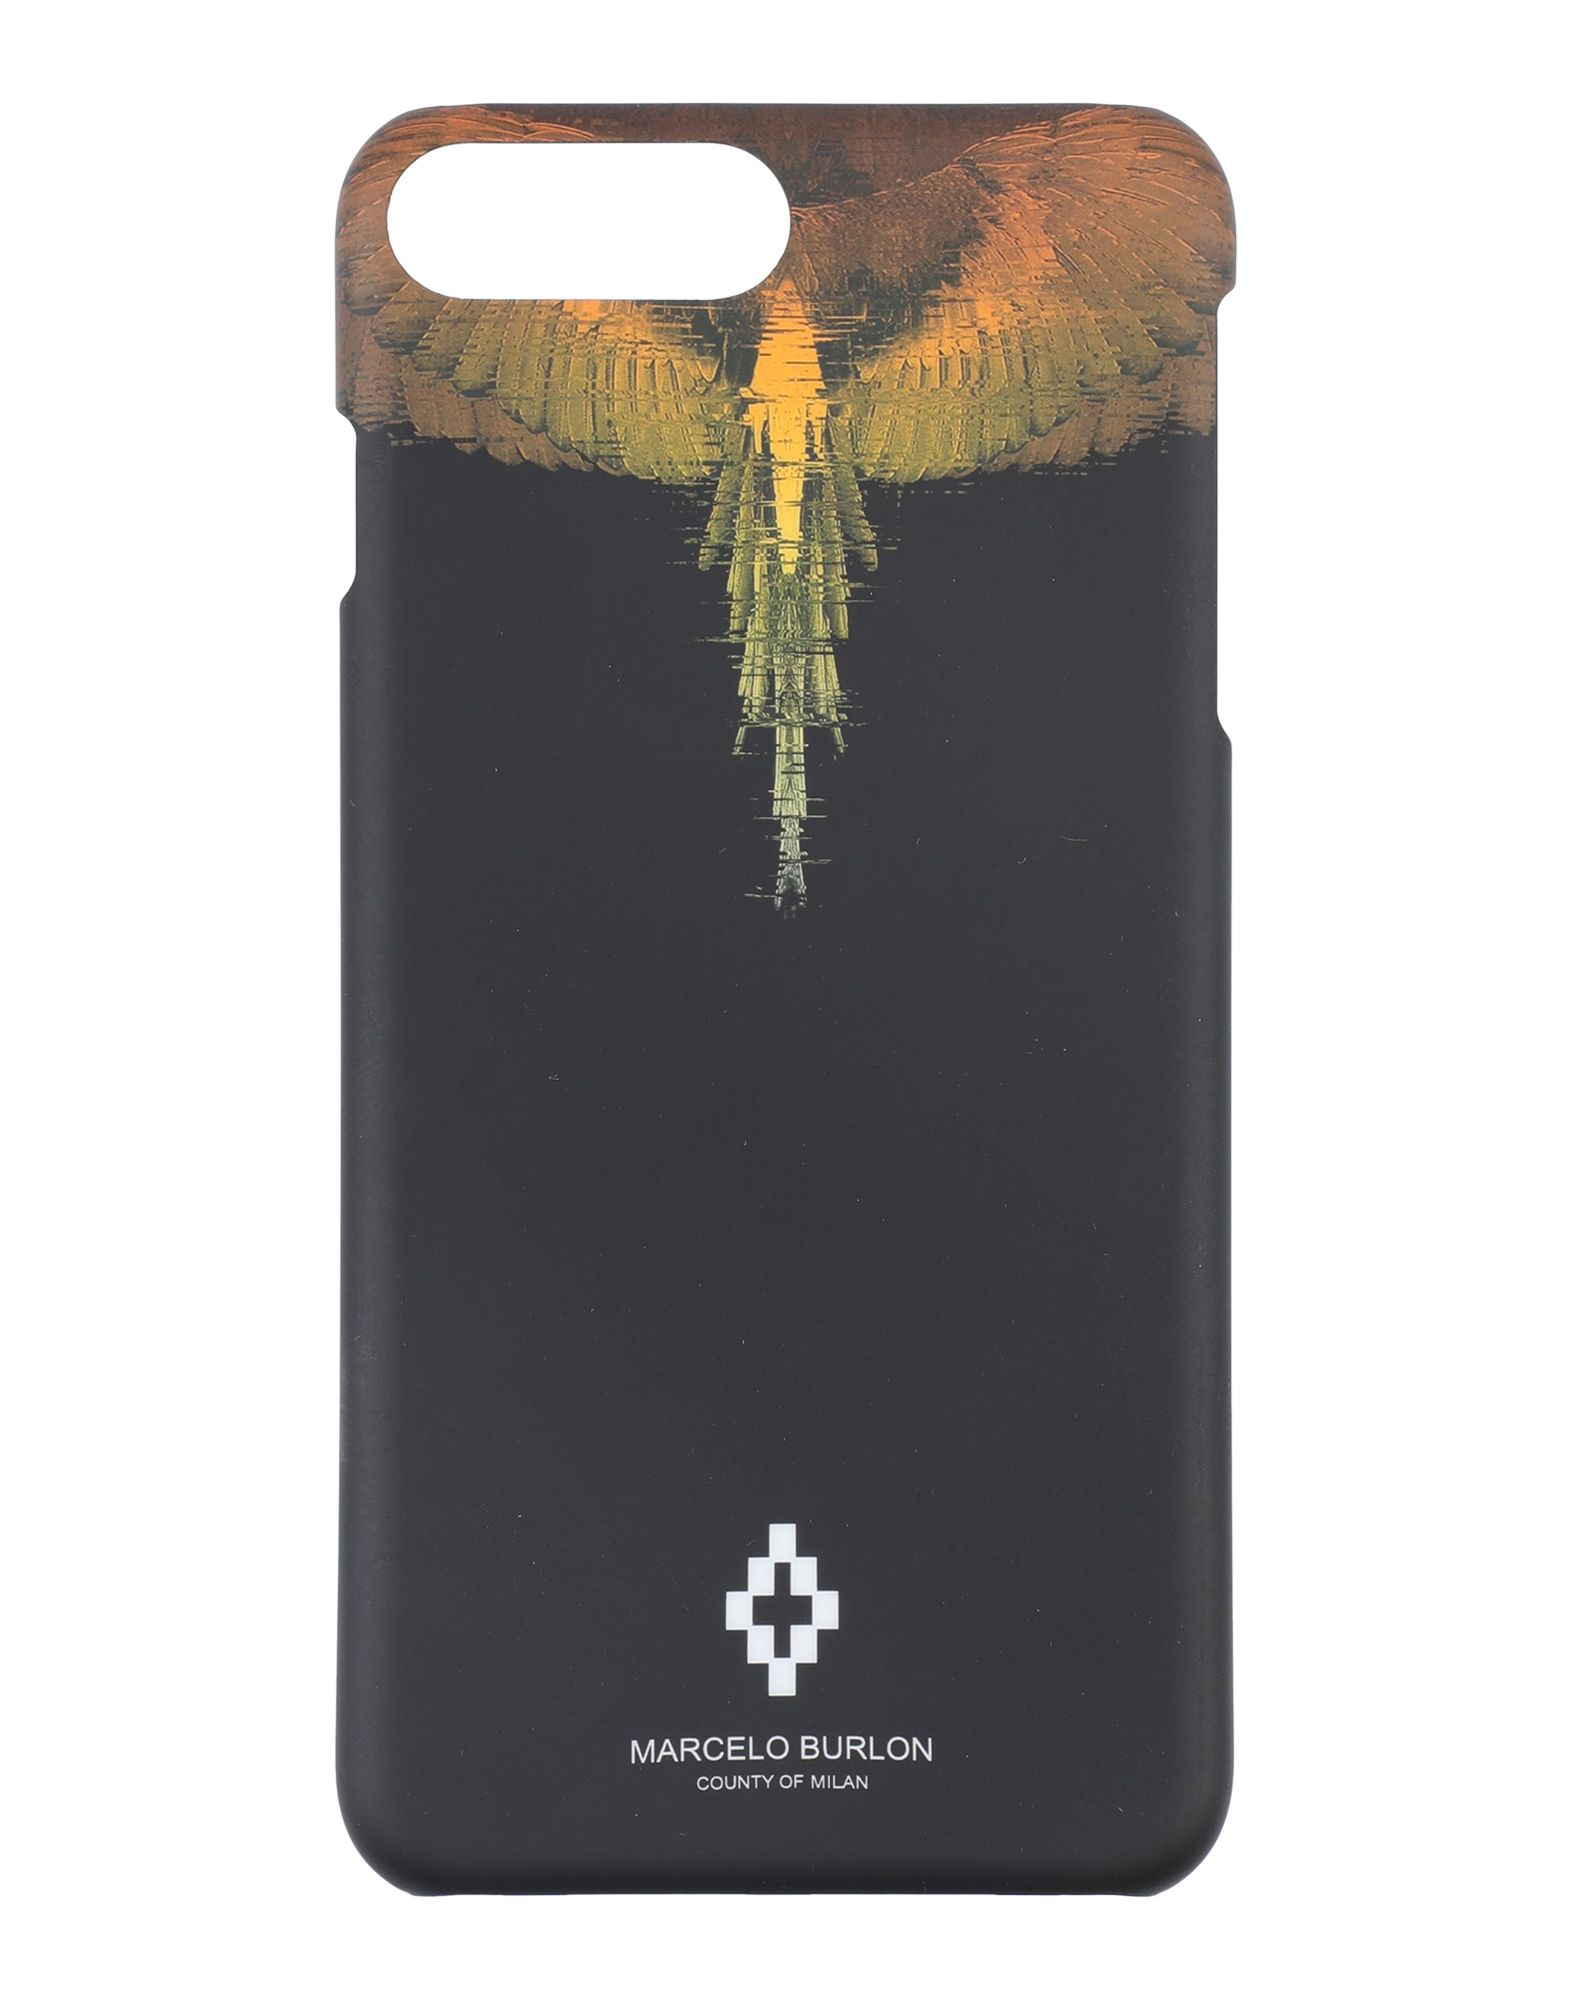 Фото - MARCELO BURLON Чехол кейс для назначение apple iphone 8 iphone 8 plus кейс для iphone 5 iphone 6 iphone 6 plus iphone 7 plus iphone 7 со стендом с окошком флип